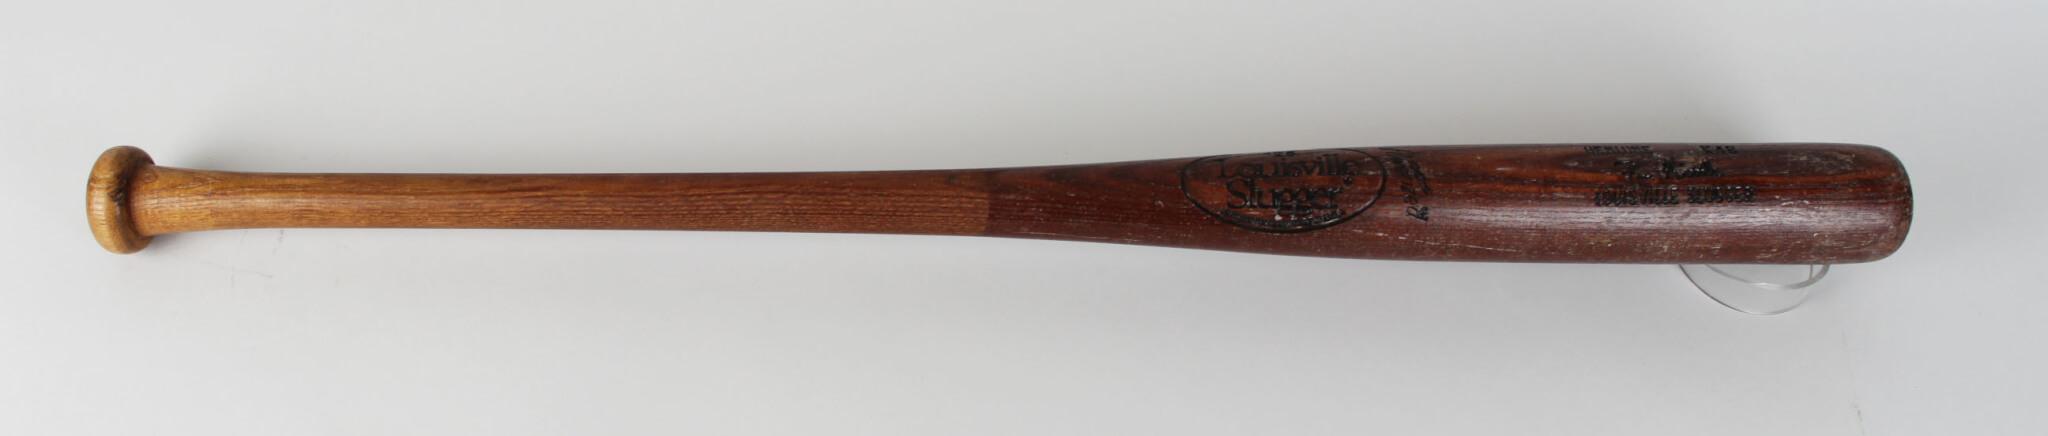 Chicago White Sox Ron Kittle Game-Used 125 Louisville Slugger Bat35444_01